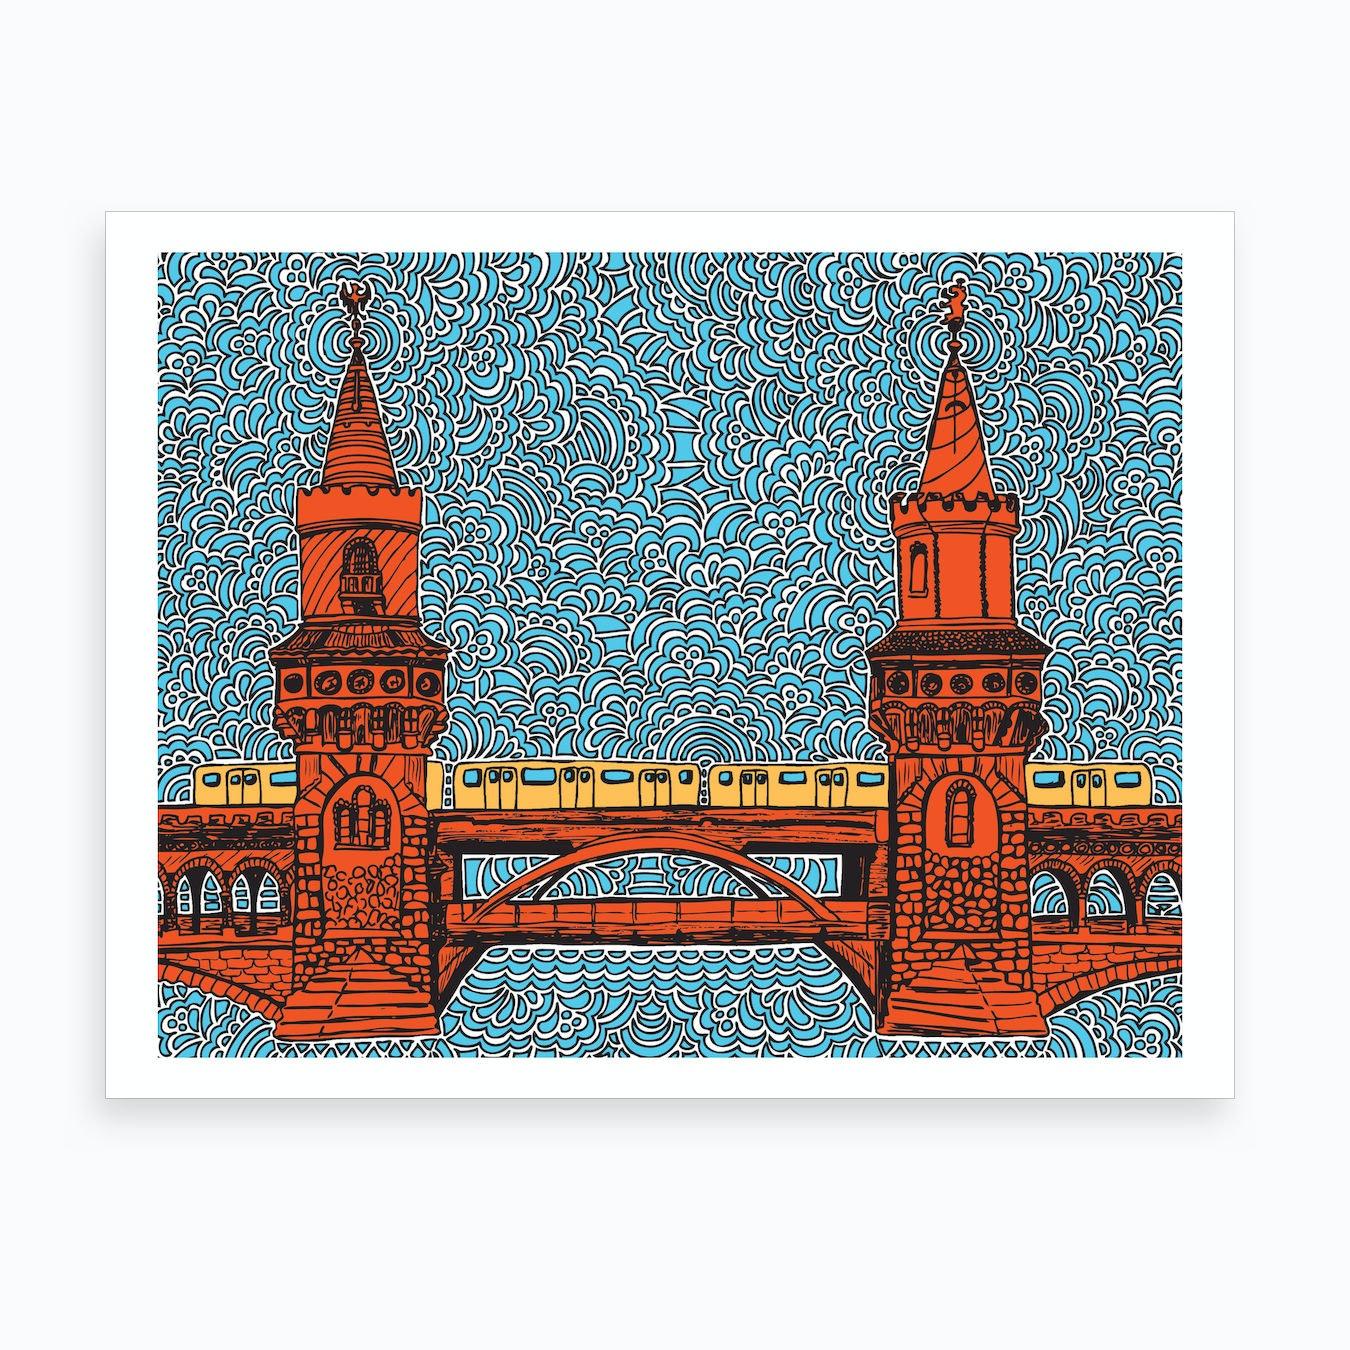 Berlin Oberbaumbrucke Art Print